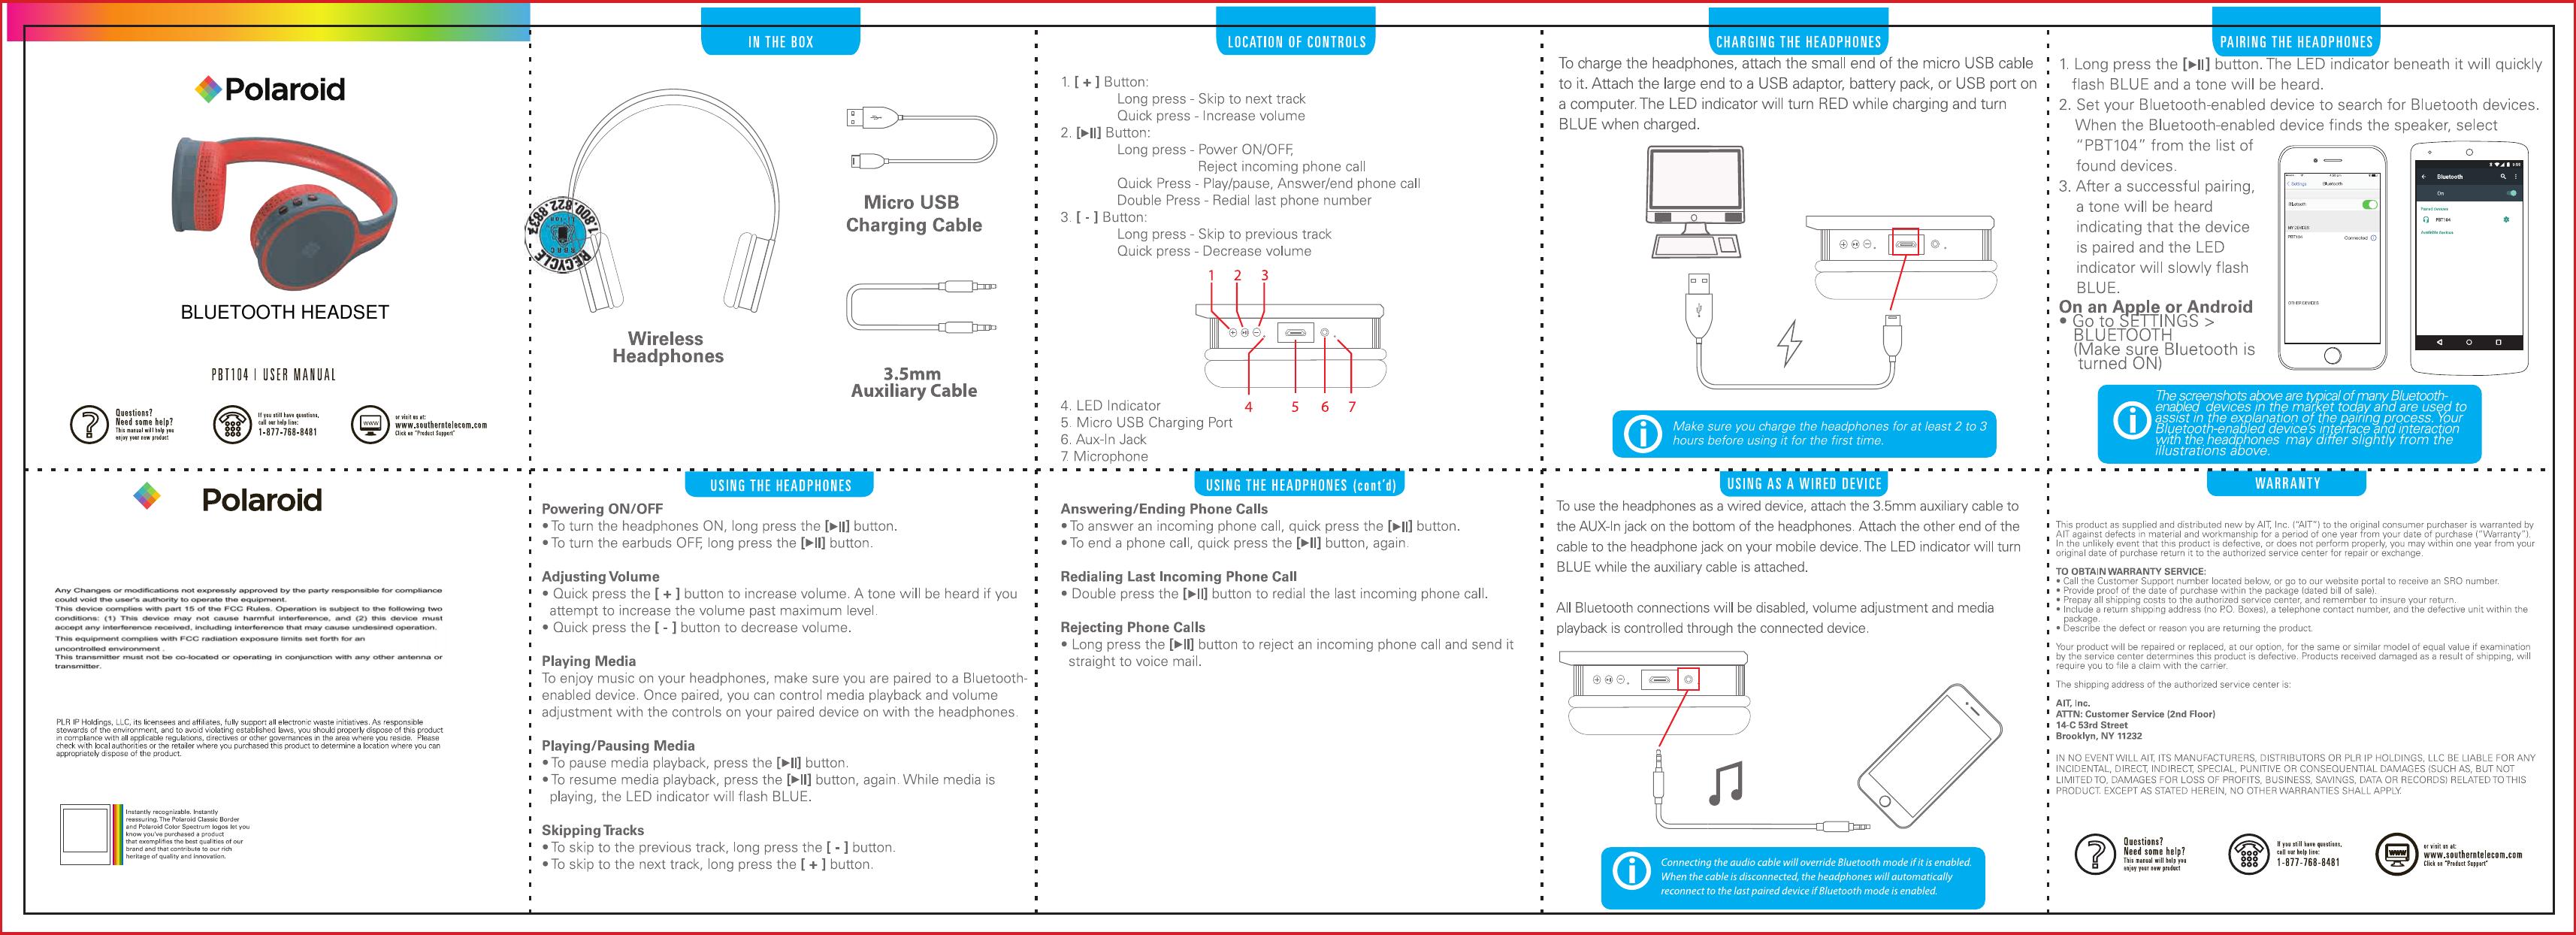 Bluetooth headset s530 manual pdf